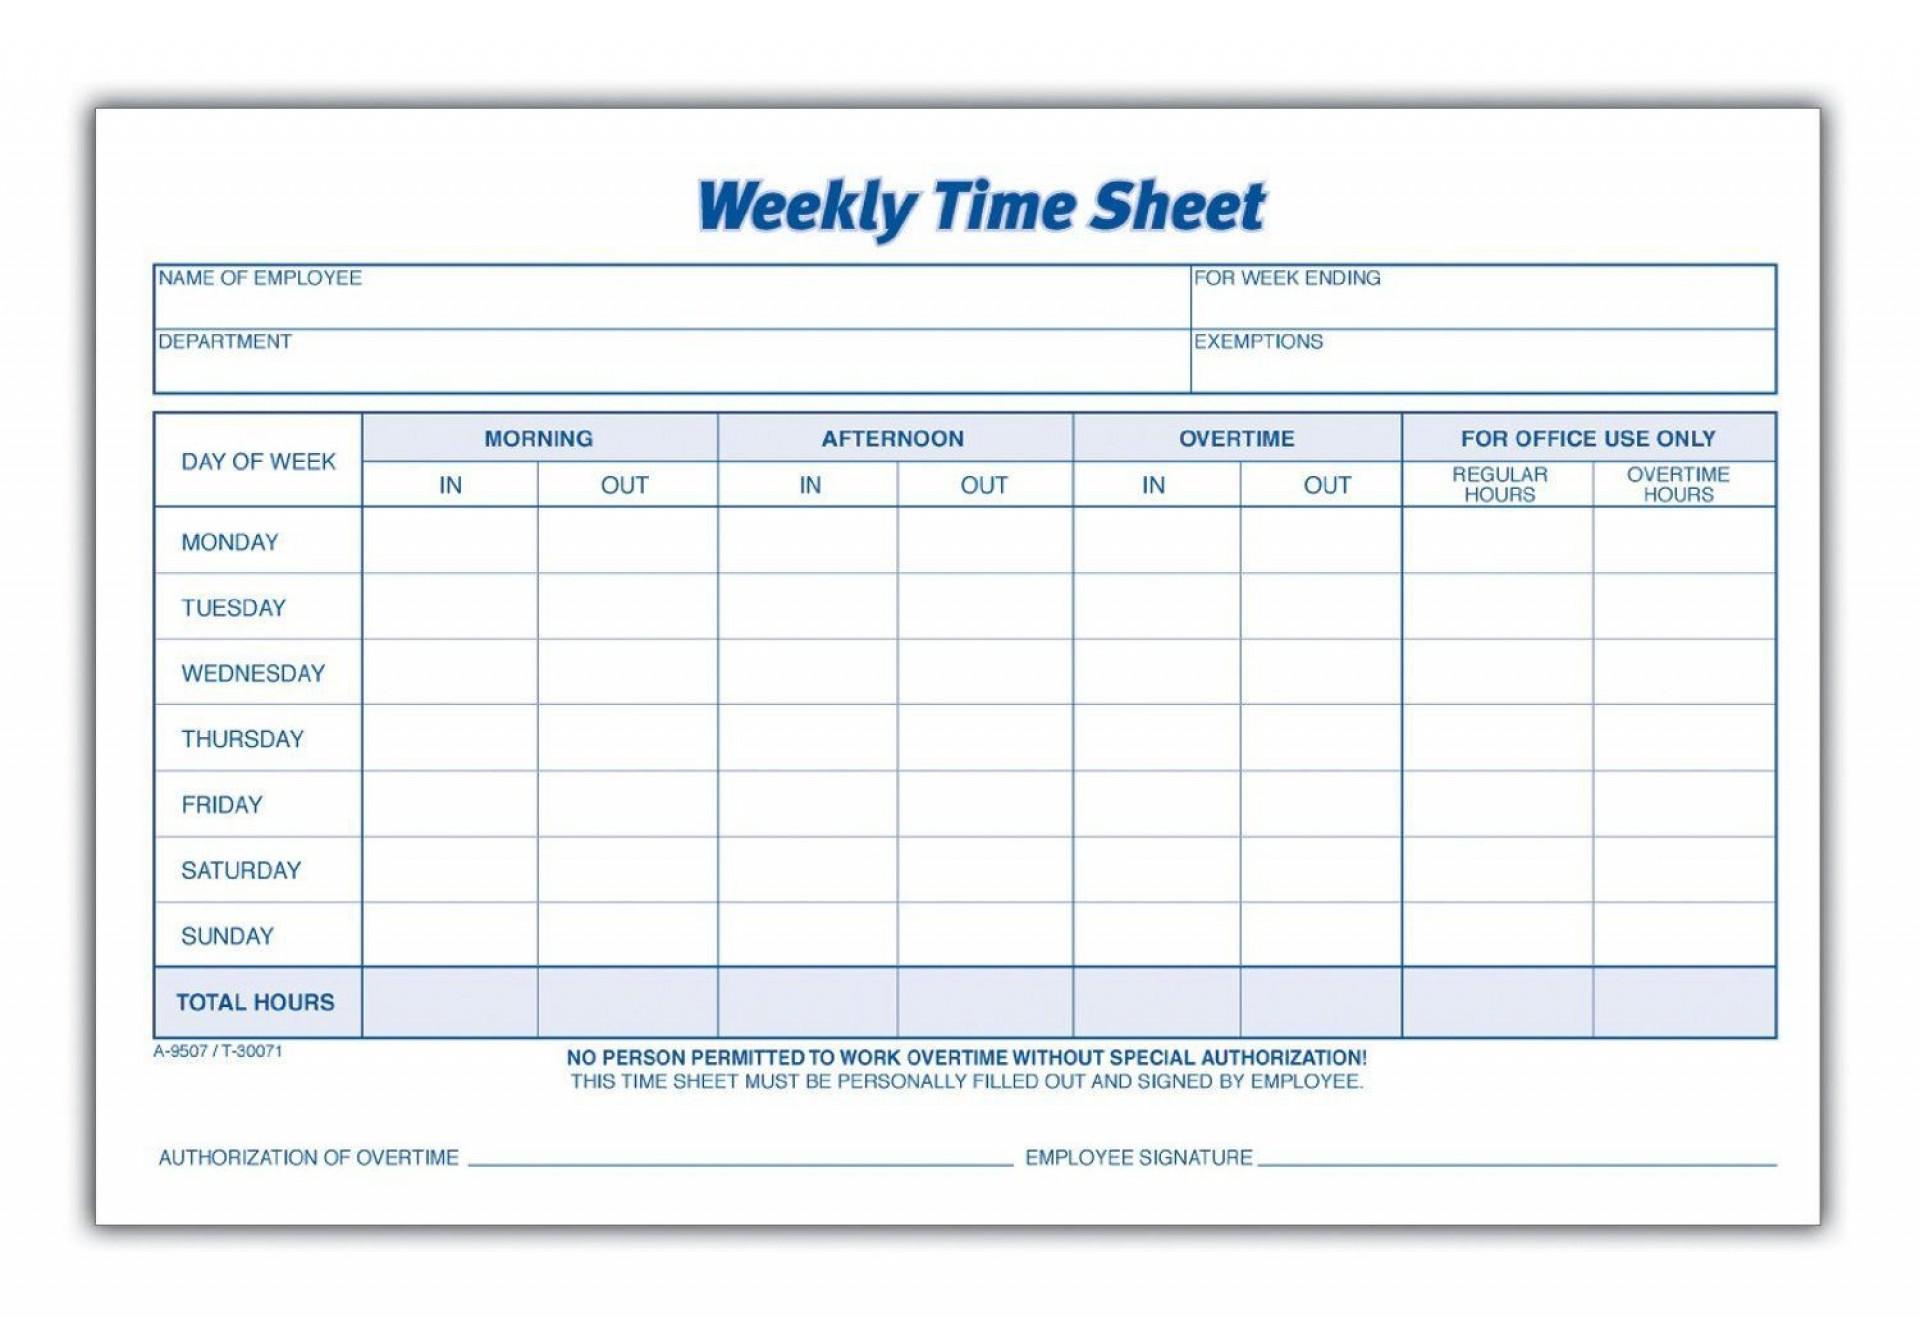 000 Rare Employee Time Card Printable Sample  Timesheet Template Excel Free Multiple Sheet1920